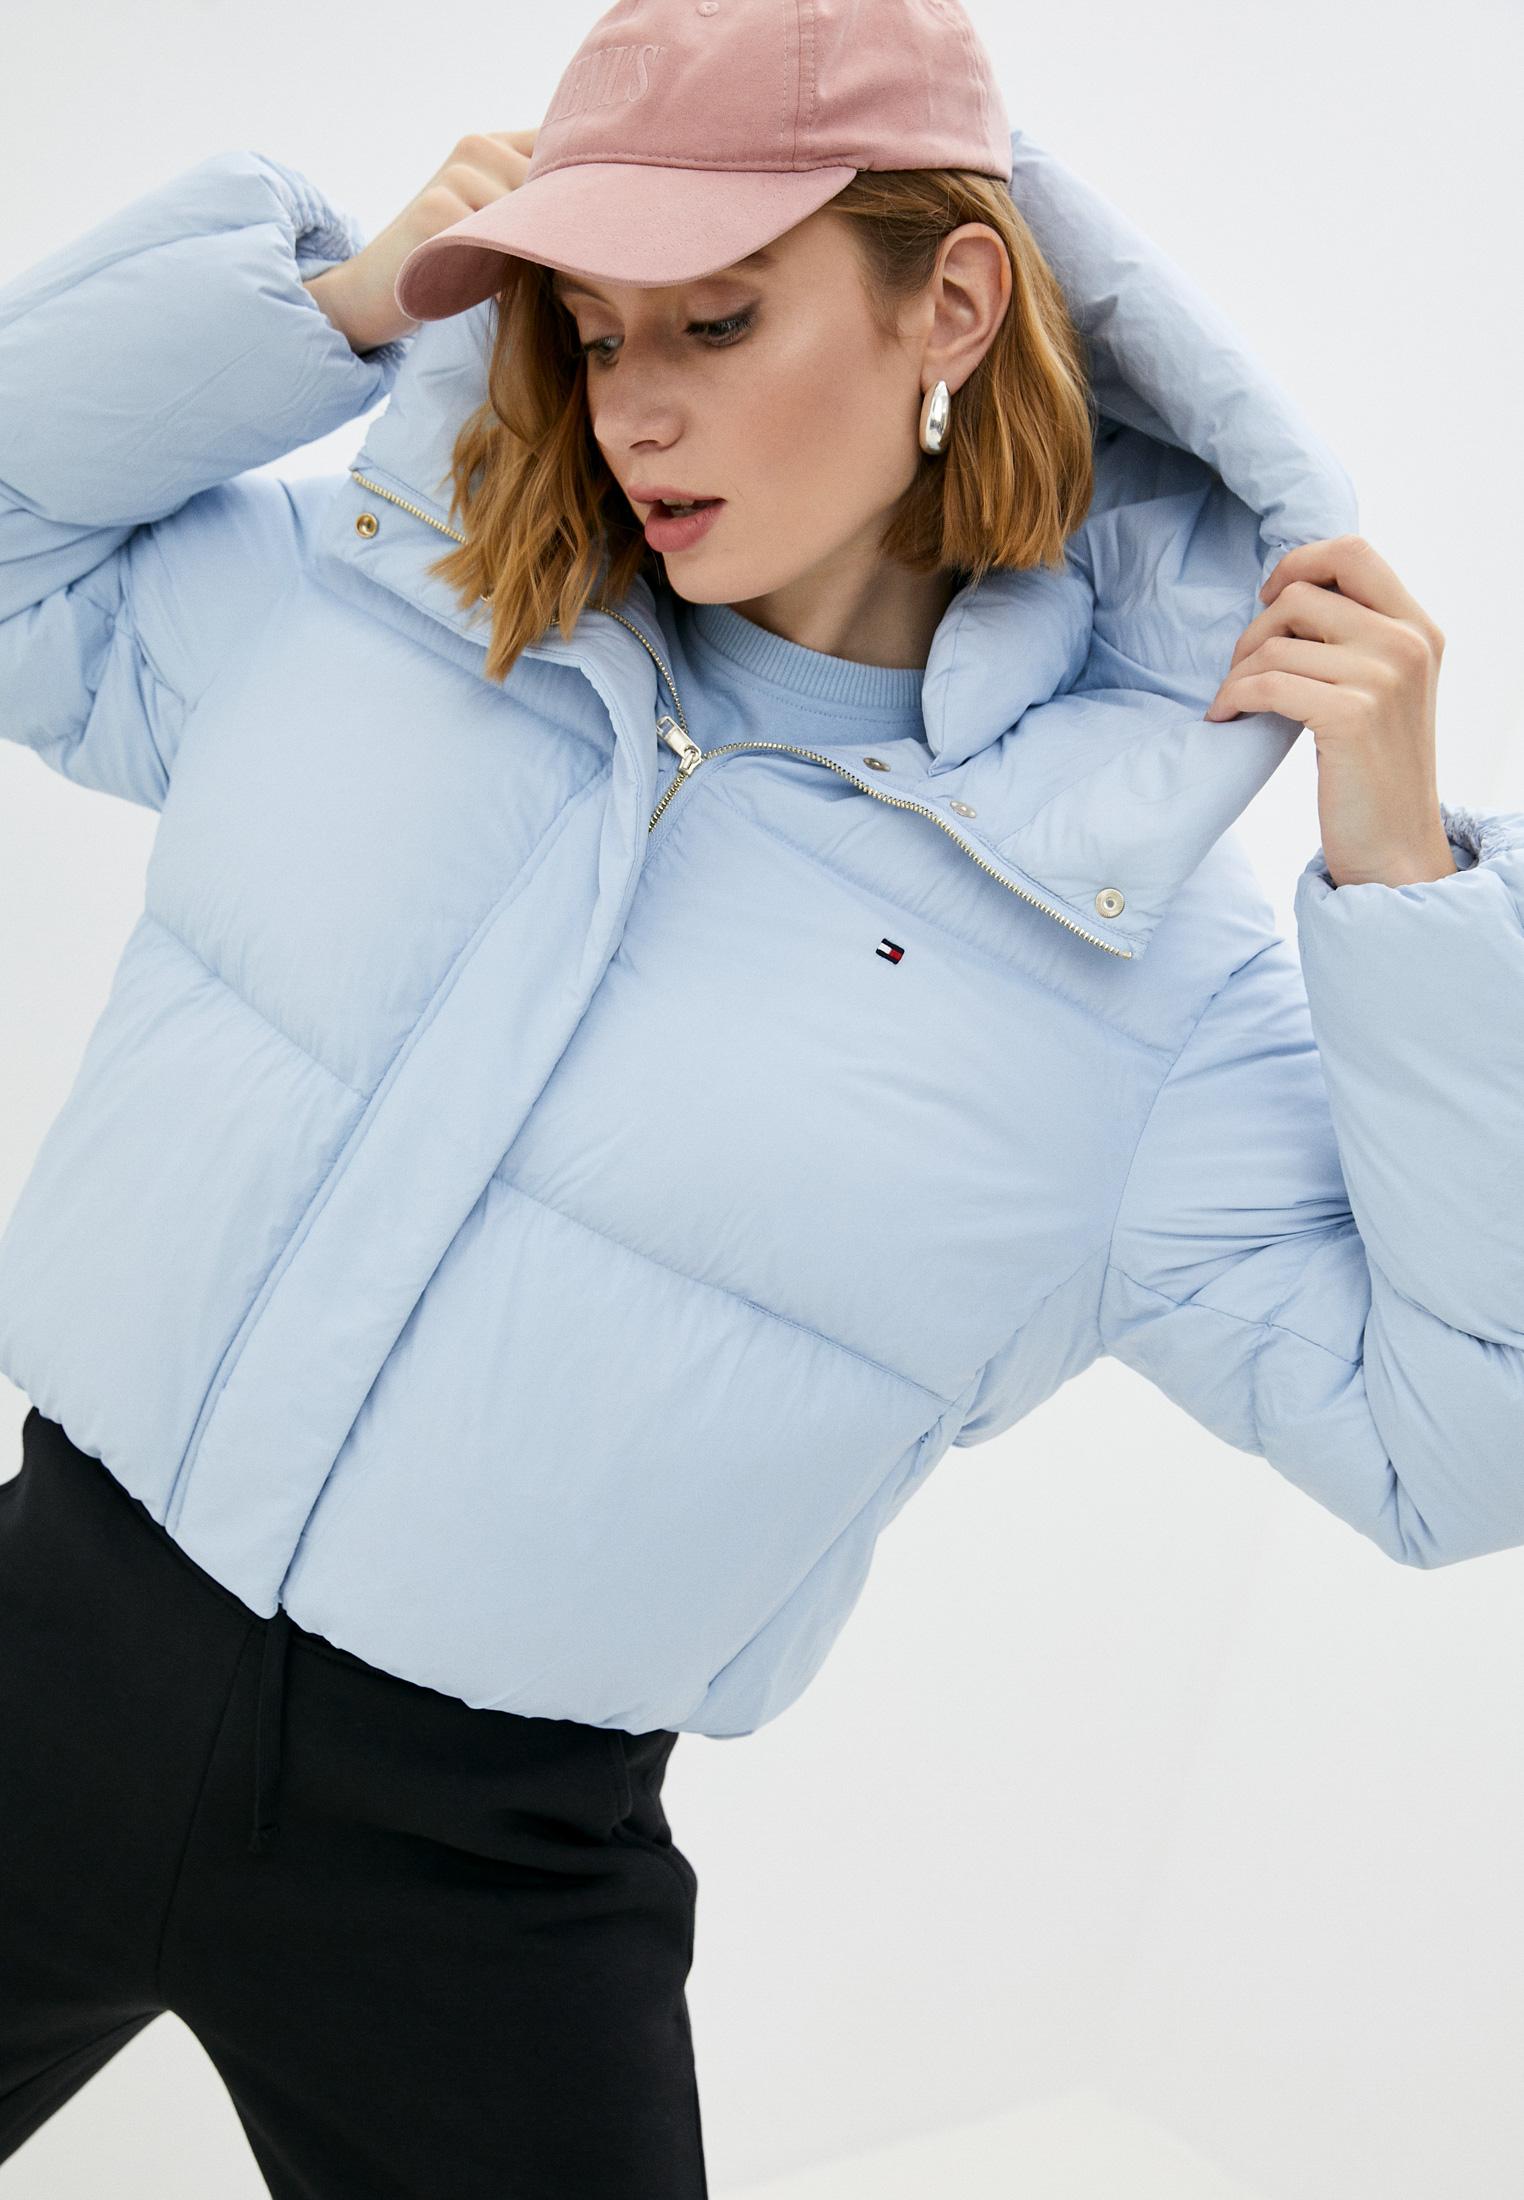 Утепленная куртка Tommy Hilfiger (Томми Хилфигер) Пуховик Tommy Hilfiger